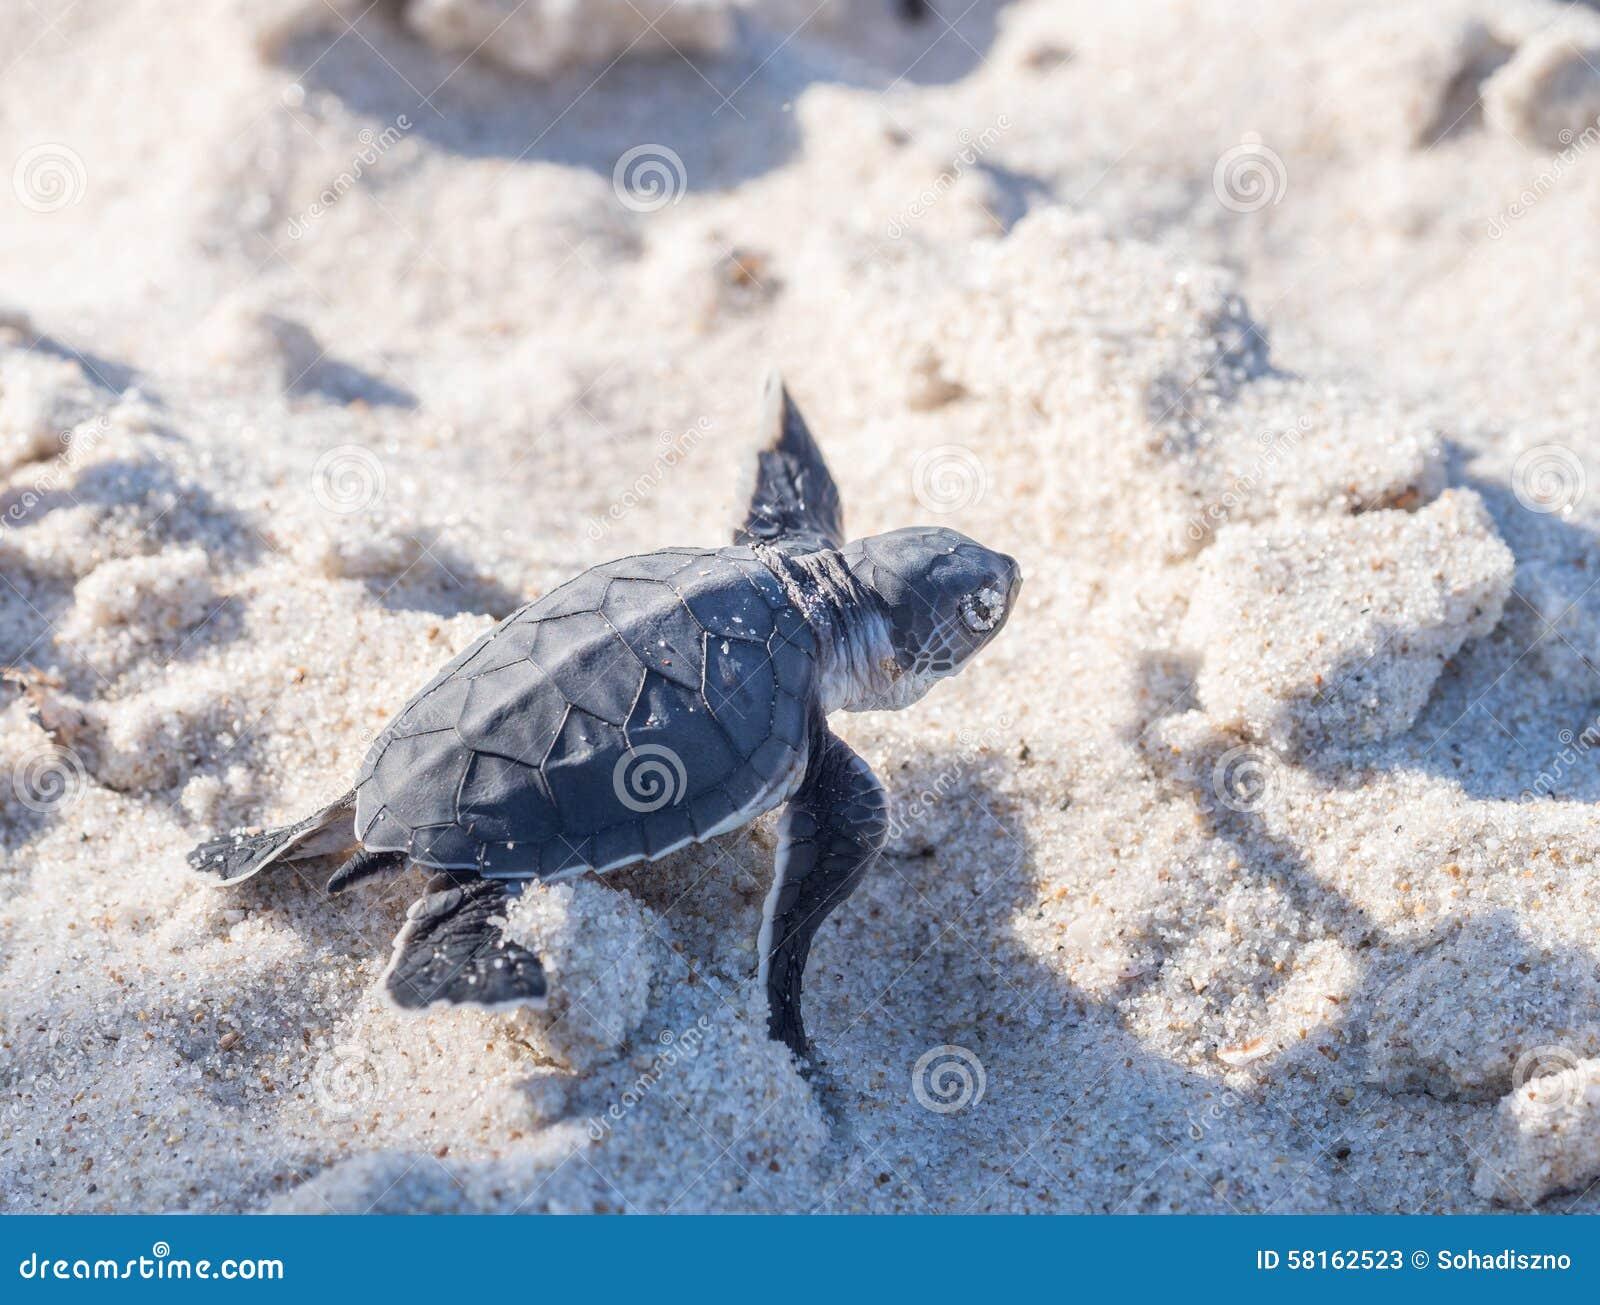 Baby Green Sea Turtle Stock Photo - Image: 58162523 - photo#24